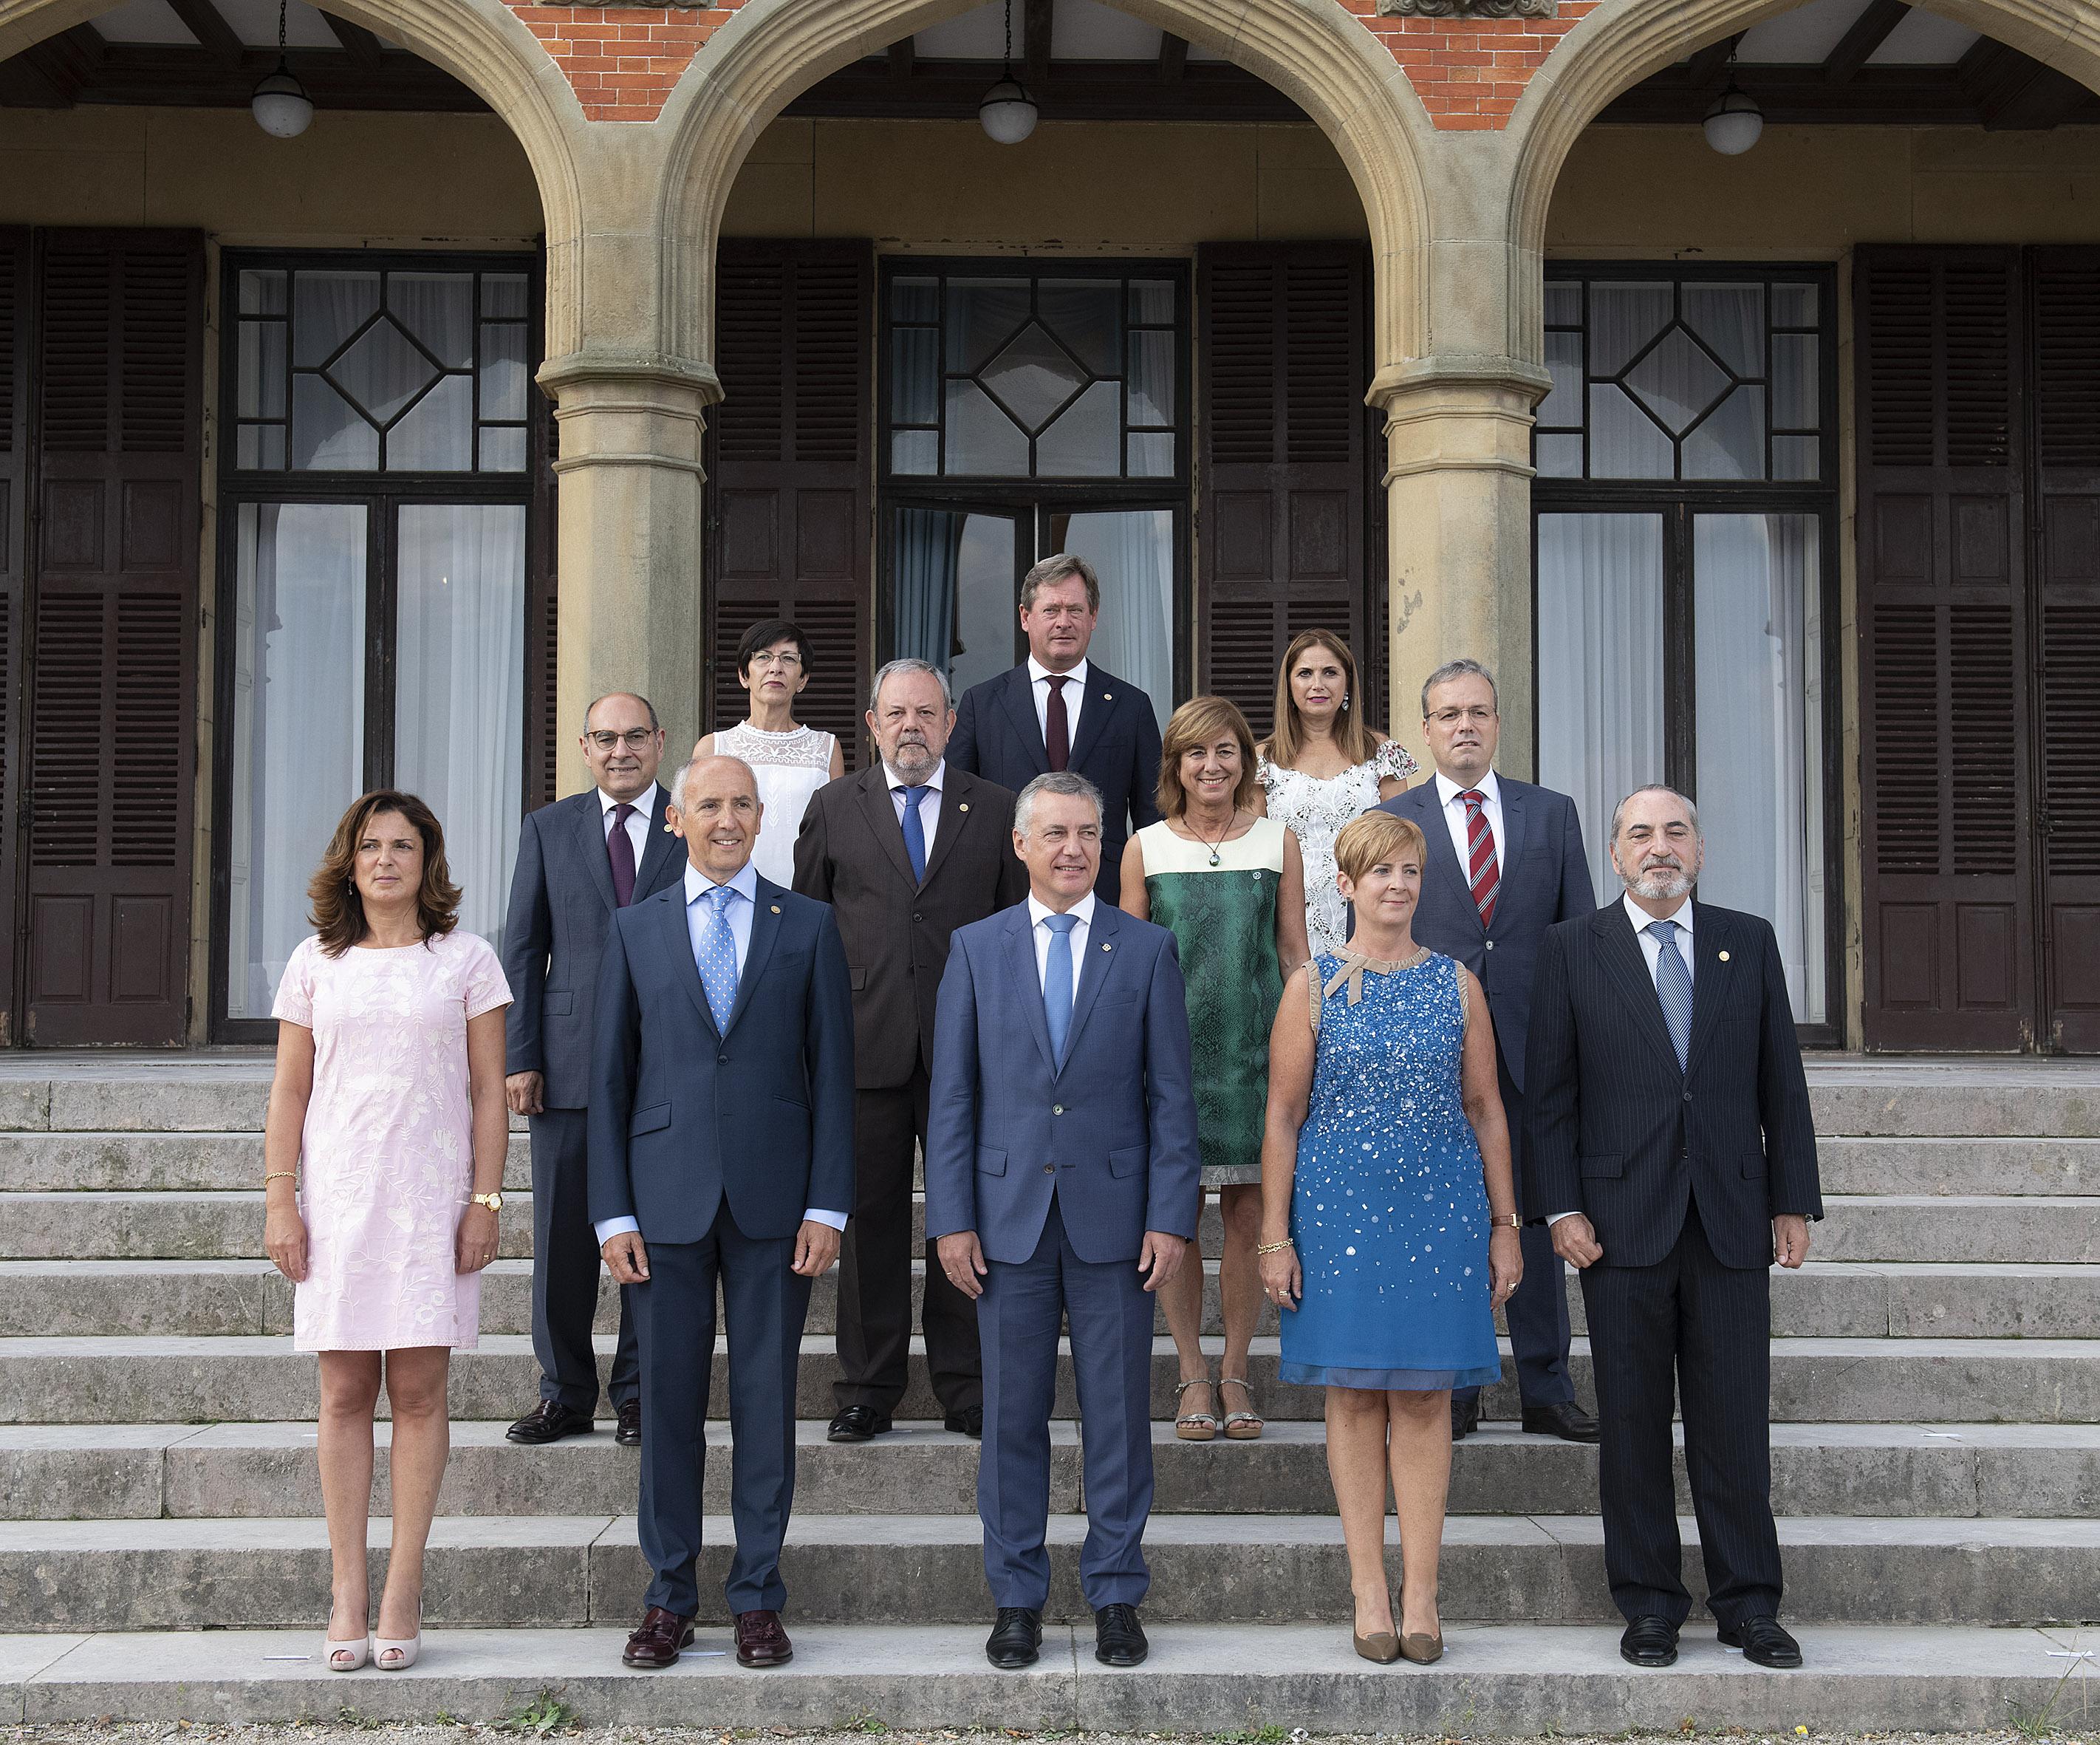 180828_lhk_consejo_gobierno_07.jpg